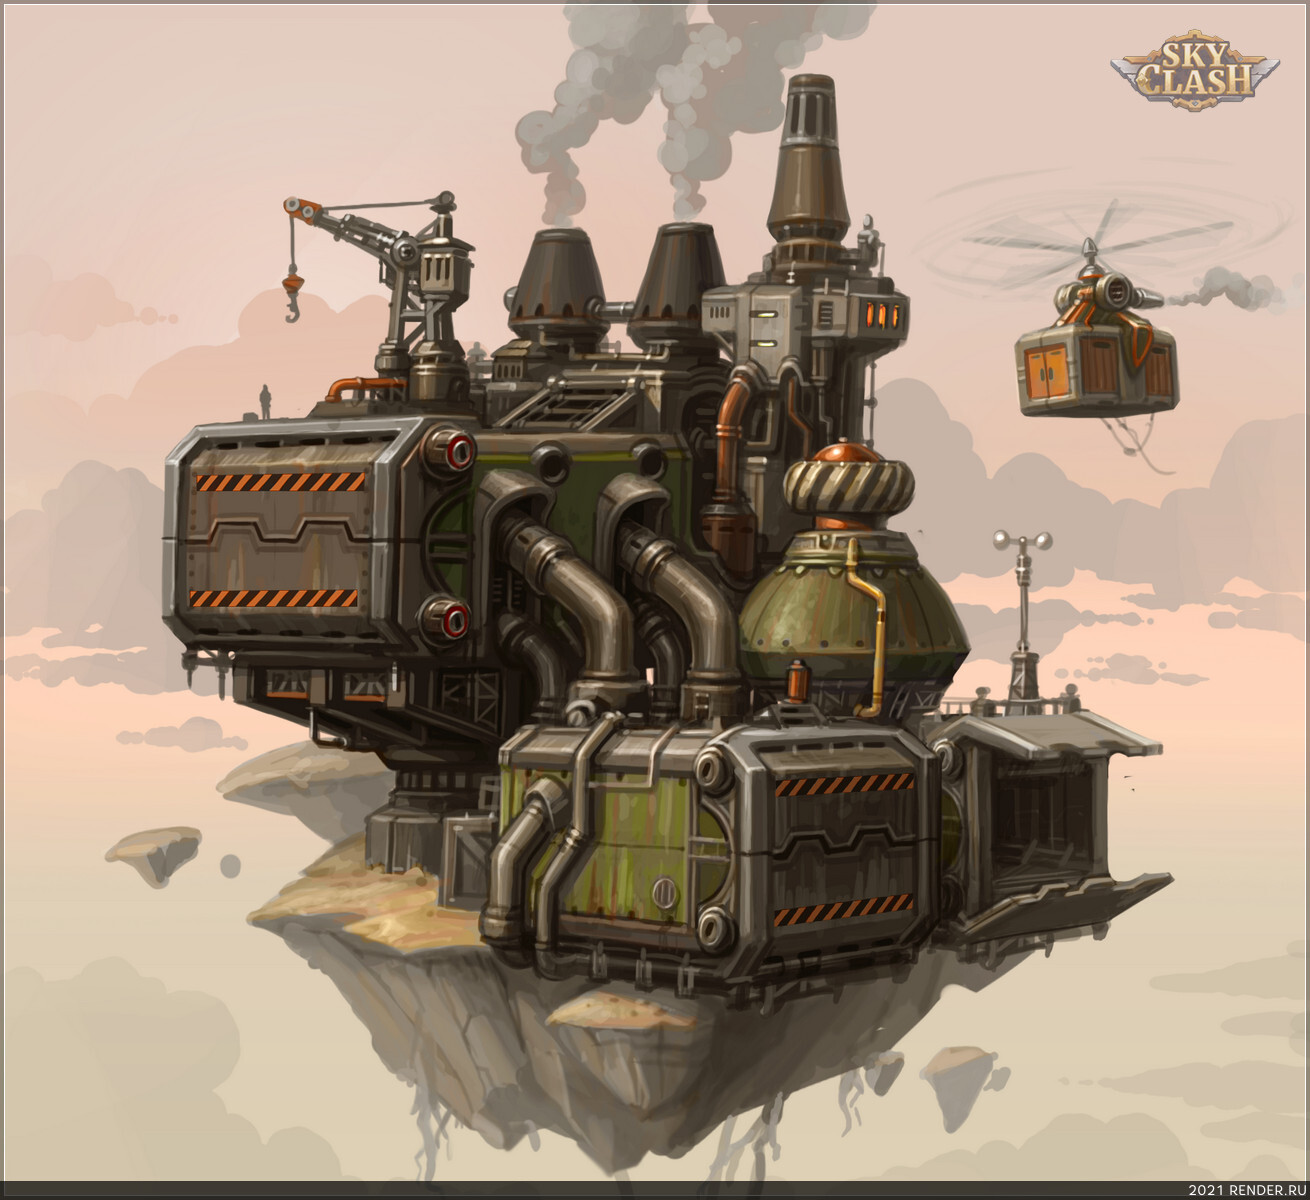 preview Sky Clash - небесная судоверфь